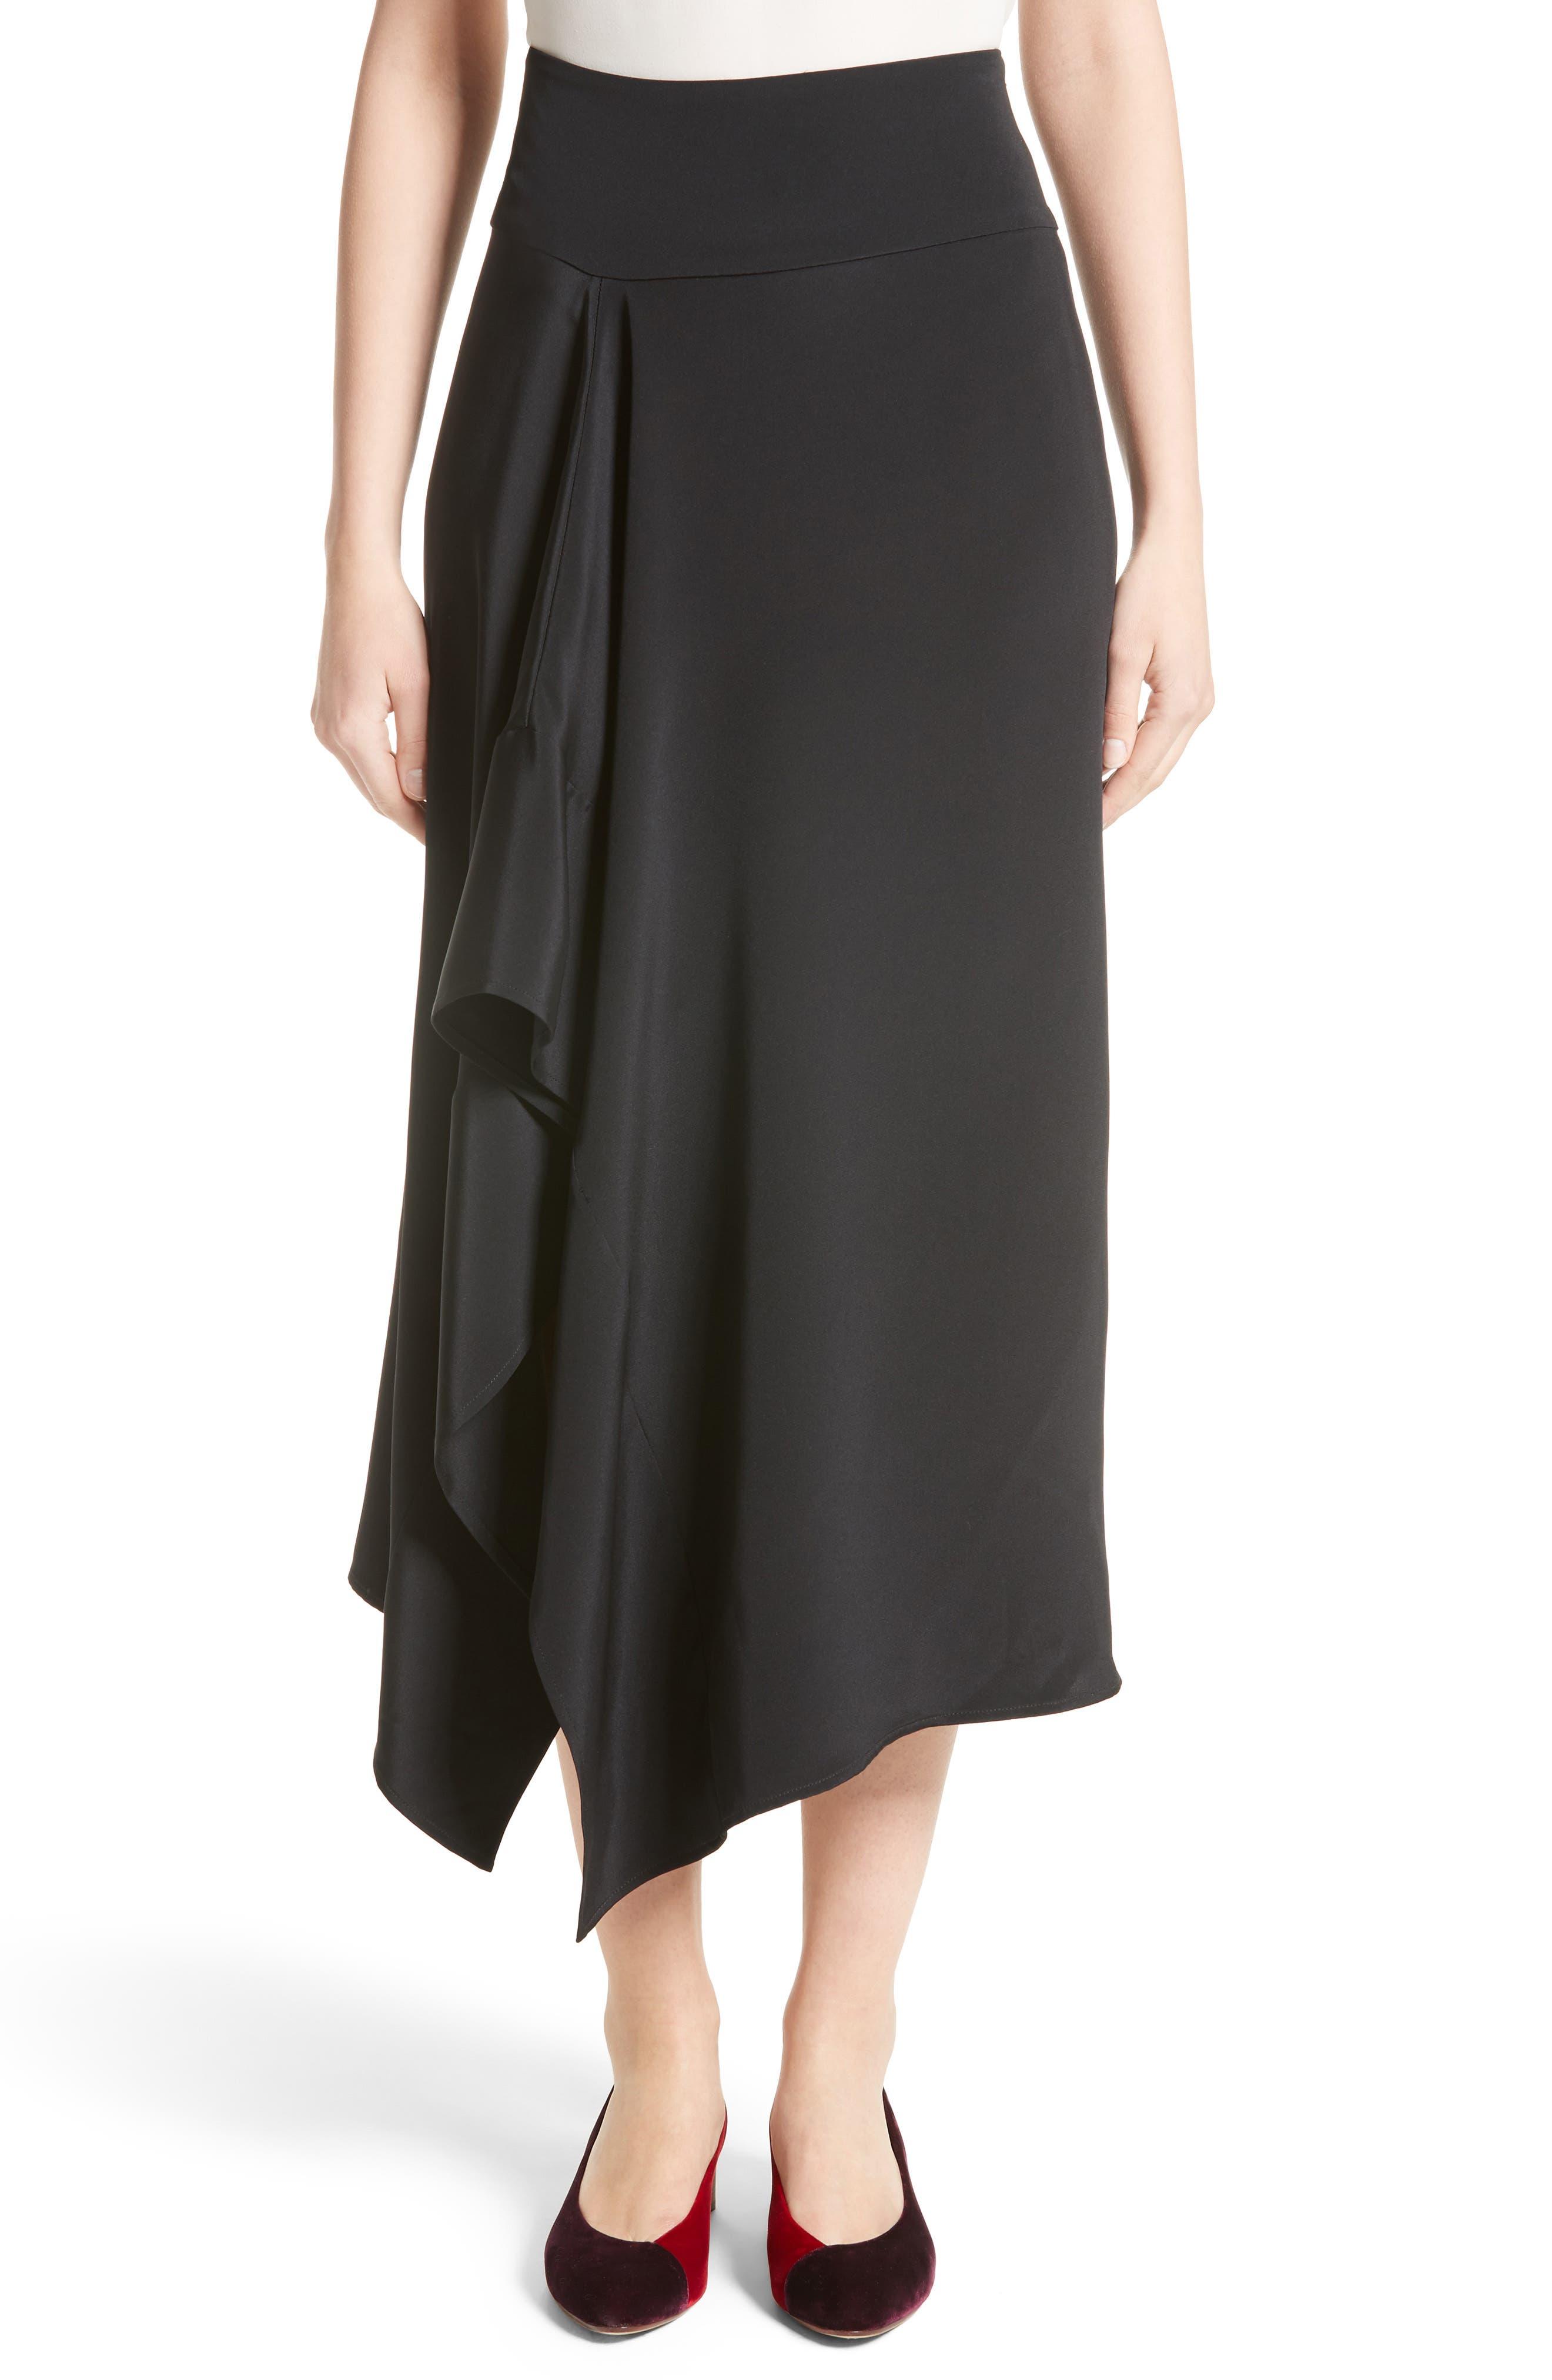 Zero + Maria Cornejo Ero Silk Crepe Skirt